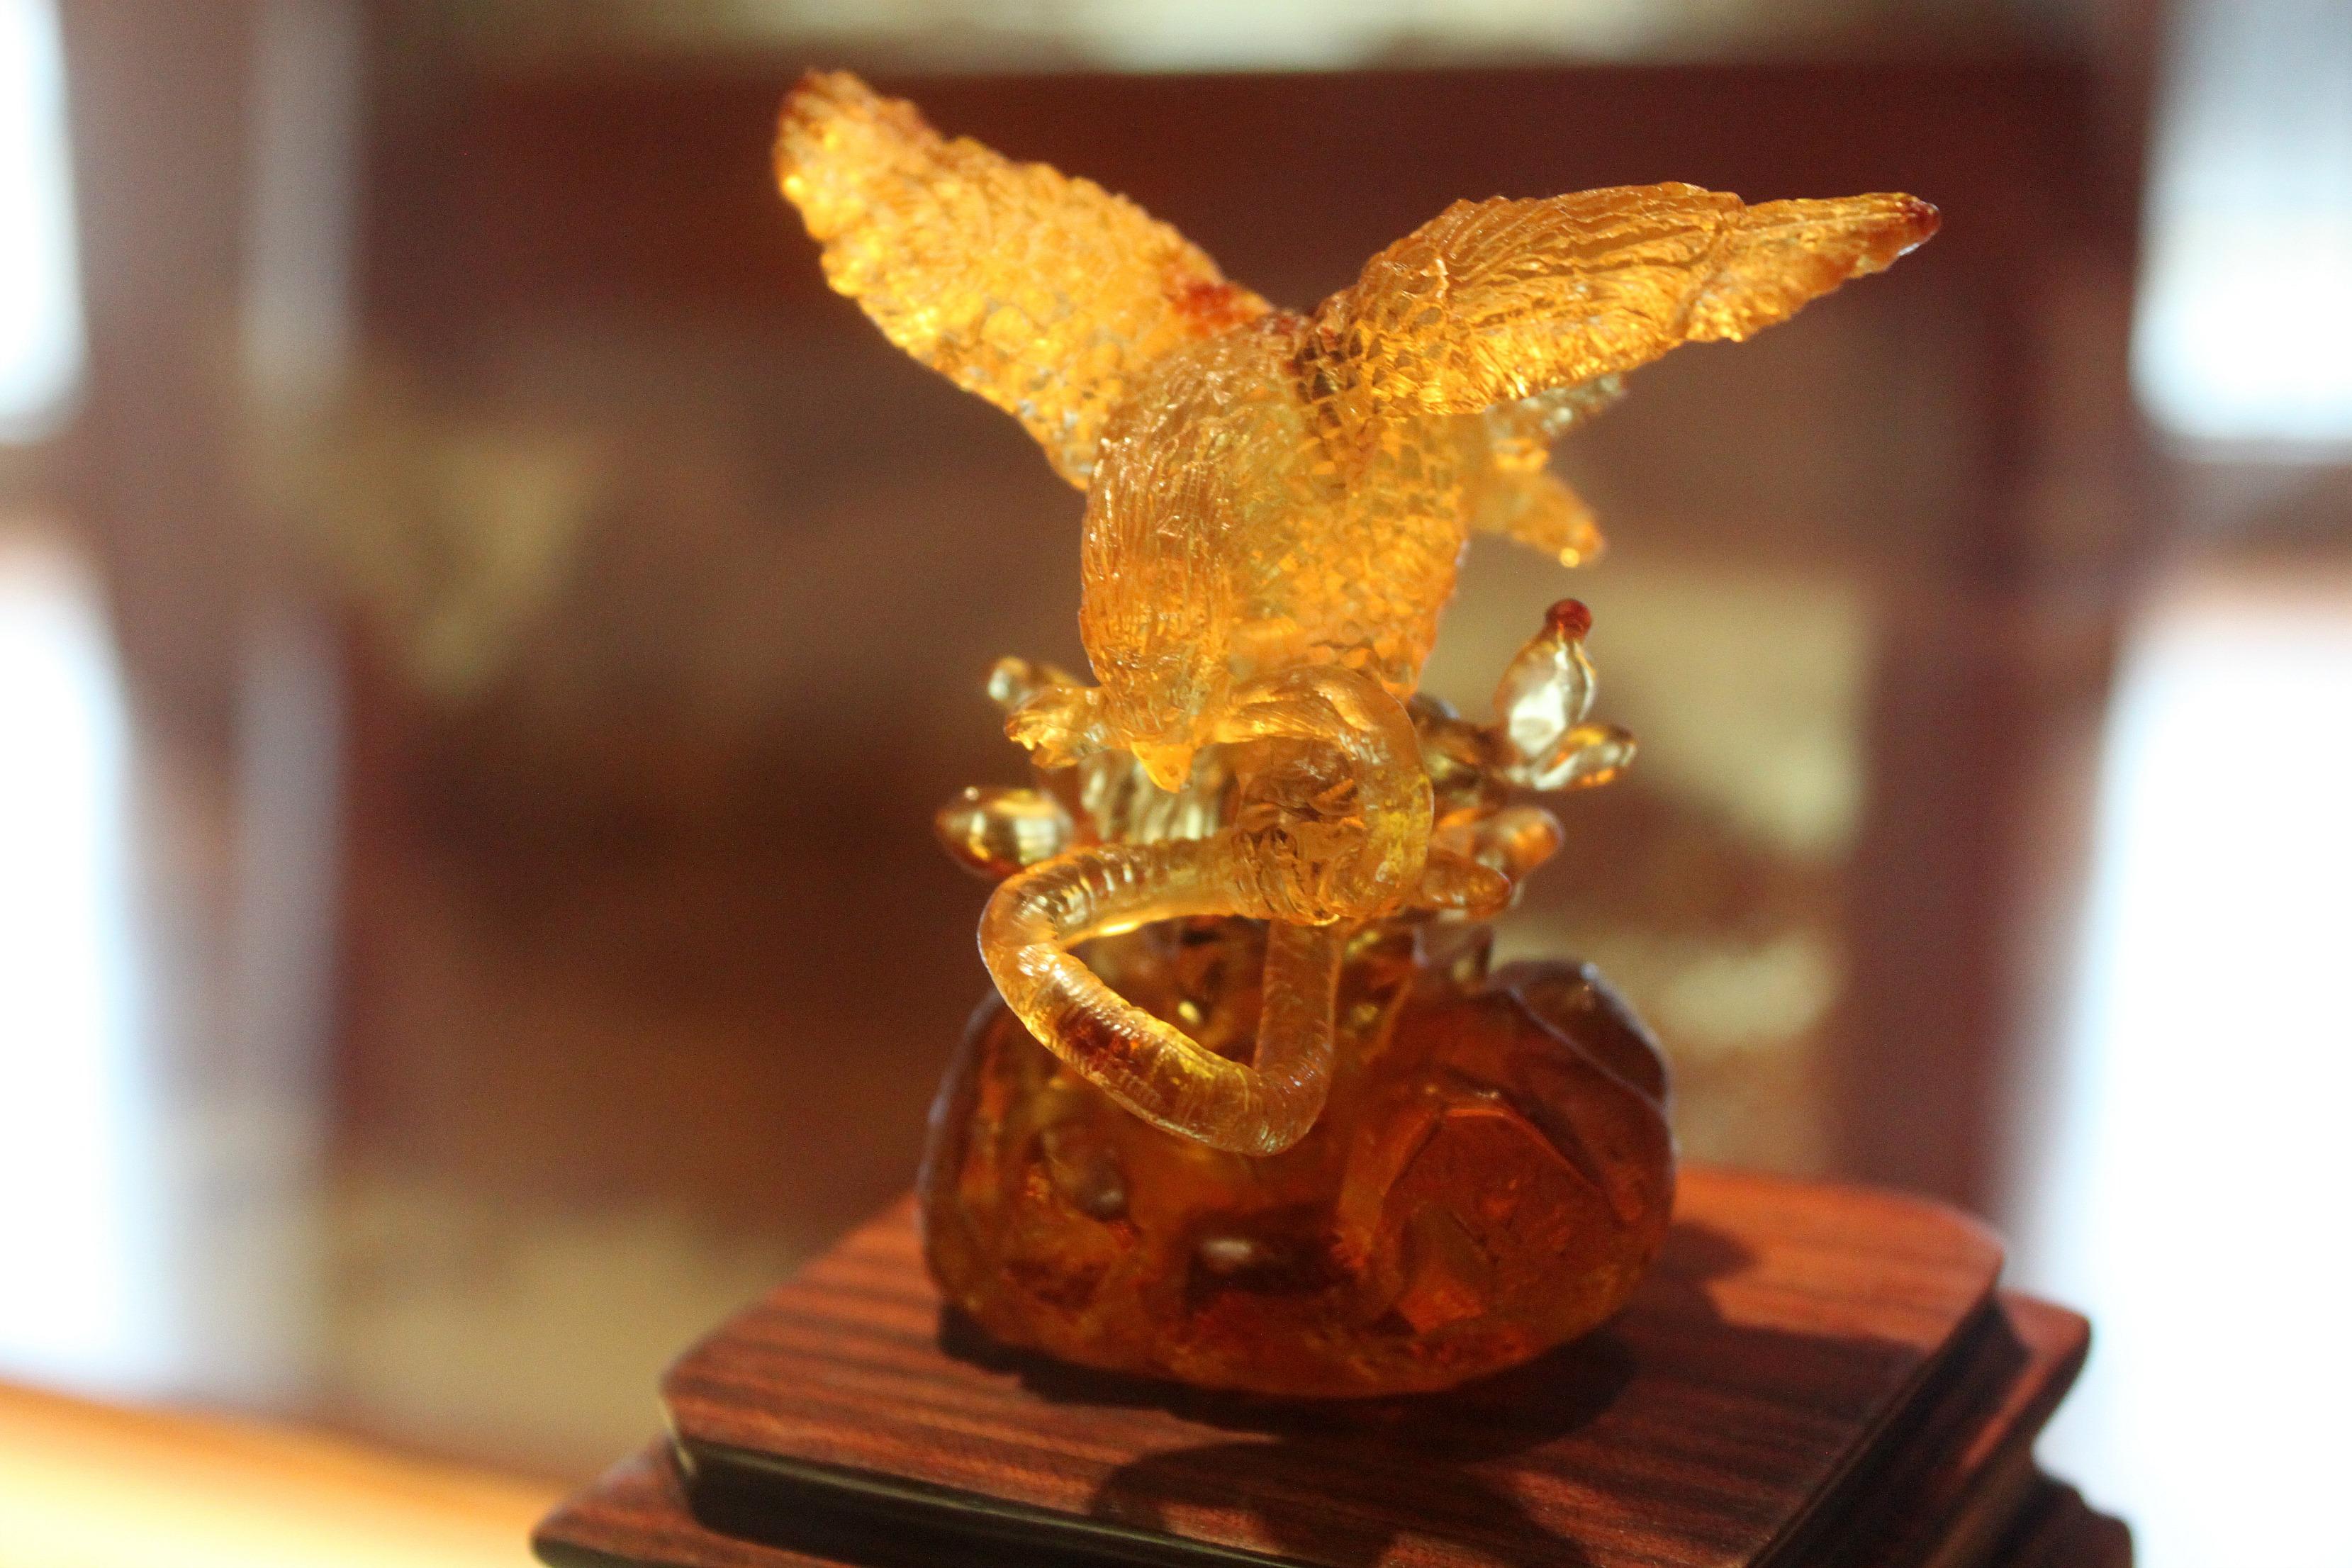 El águila nacional de ámbar en el Museo Ámbar de Chiapas |Foto: Arlene Bayliss